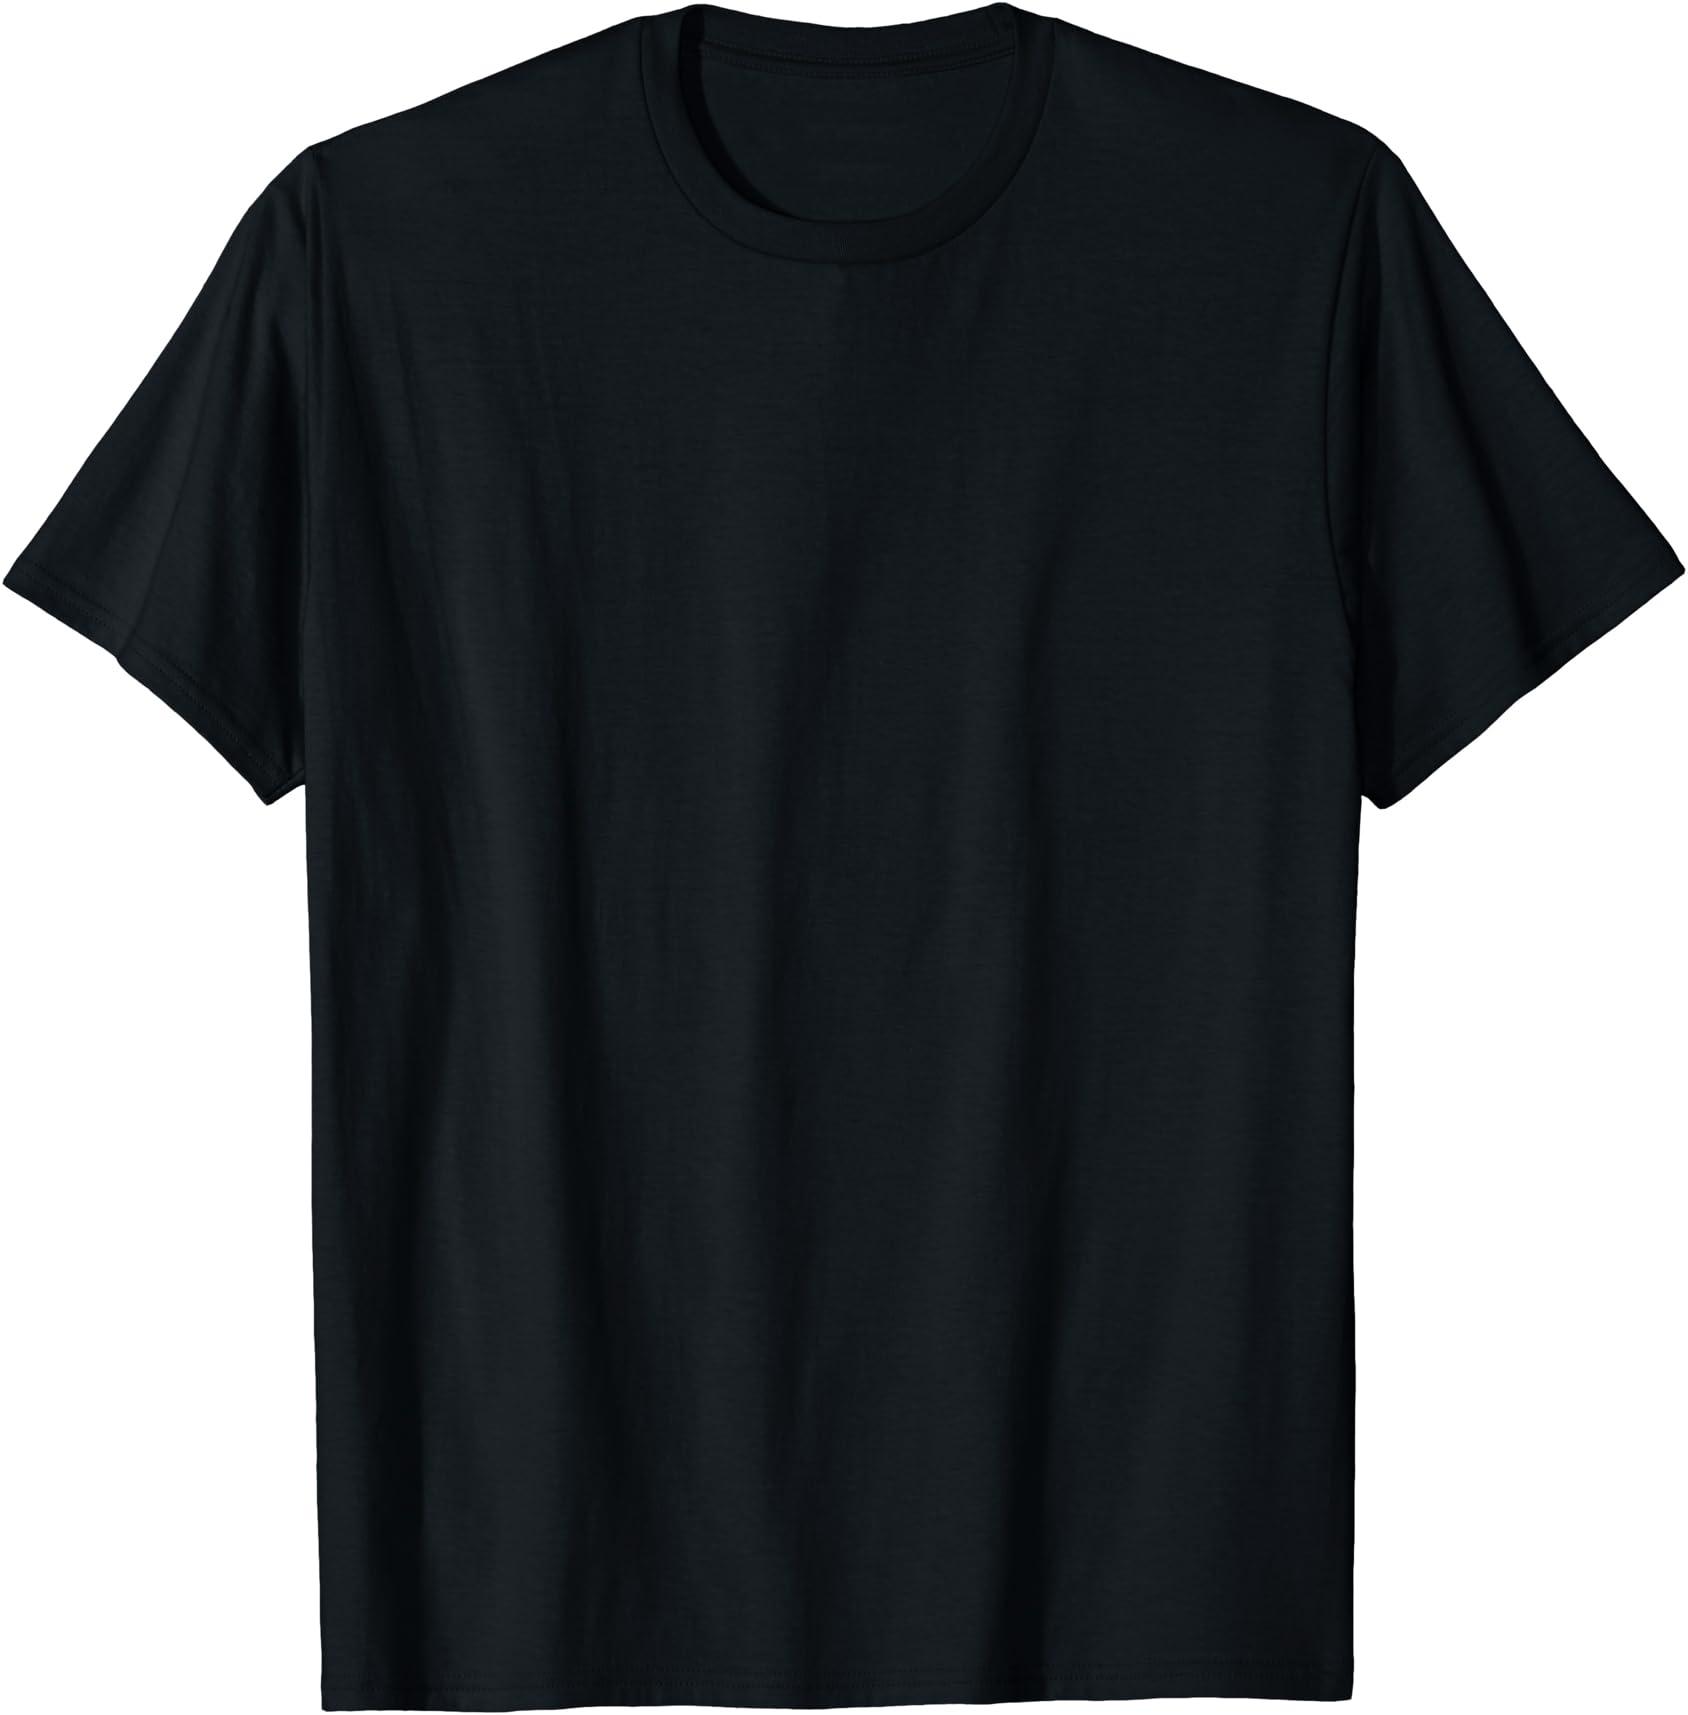 Funny Novelty T-Shirt Mens tee TShirt Love Wife Go Kayaking